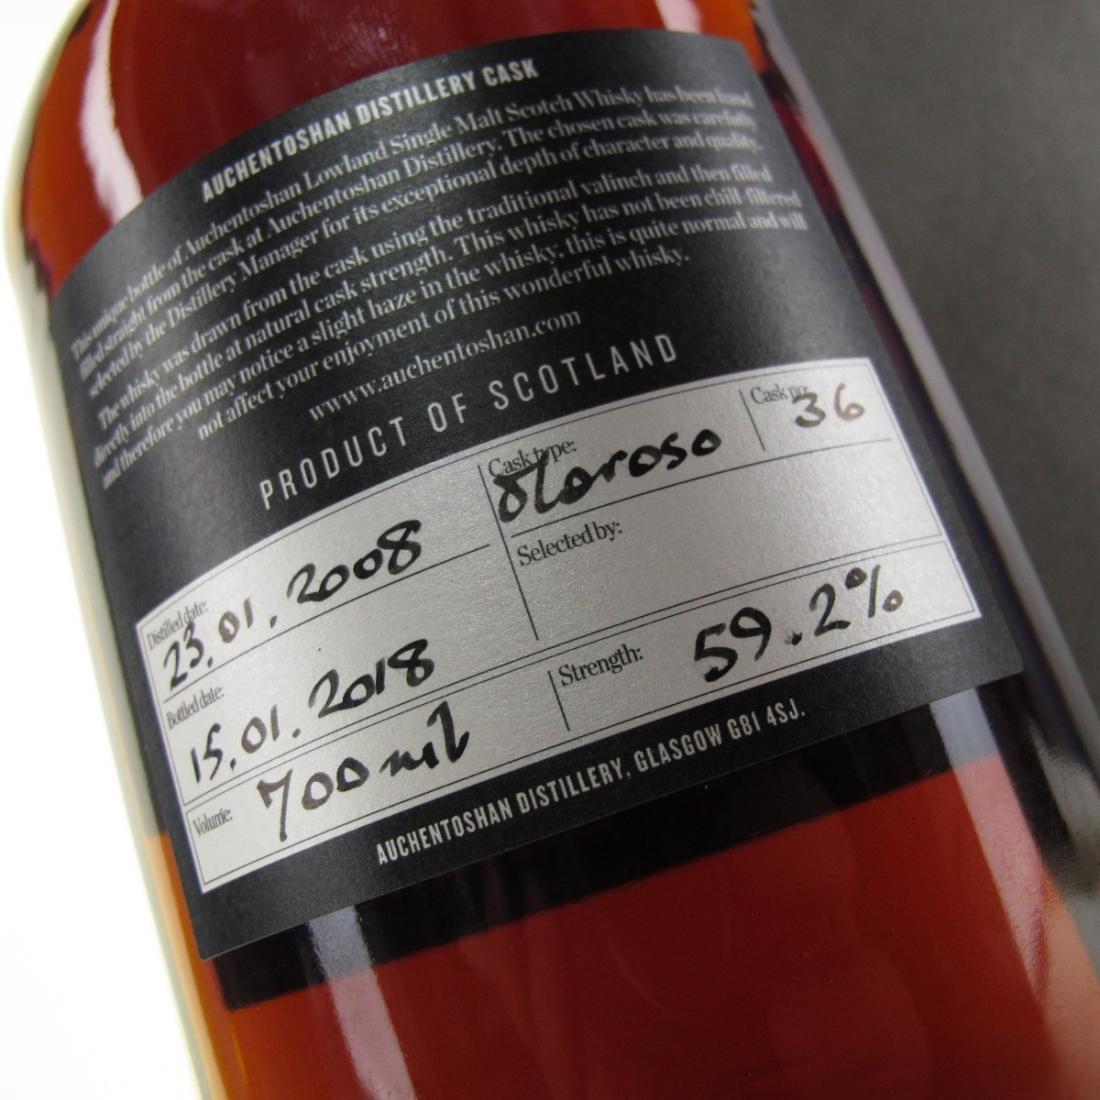 Auchentoshan 2008 Distillery Cask #36 / Oloroso